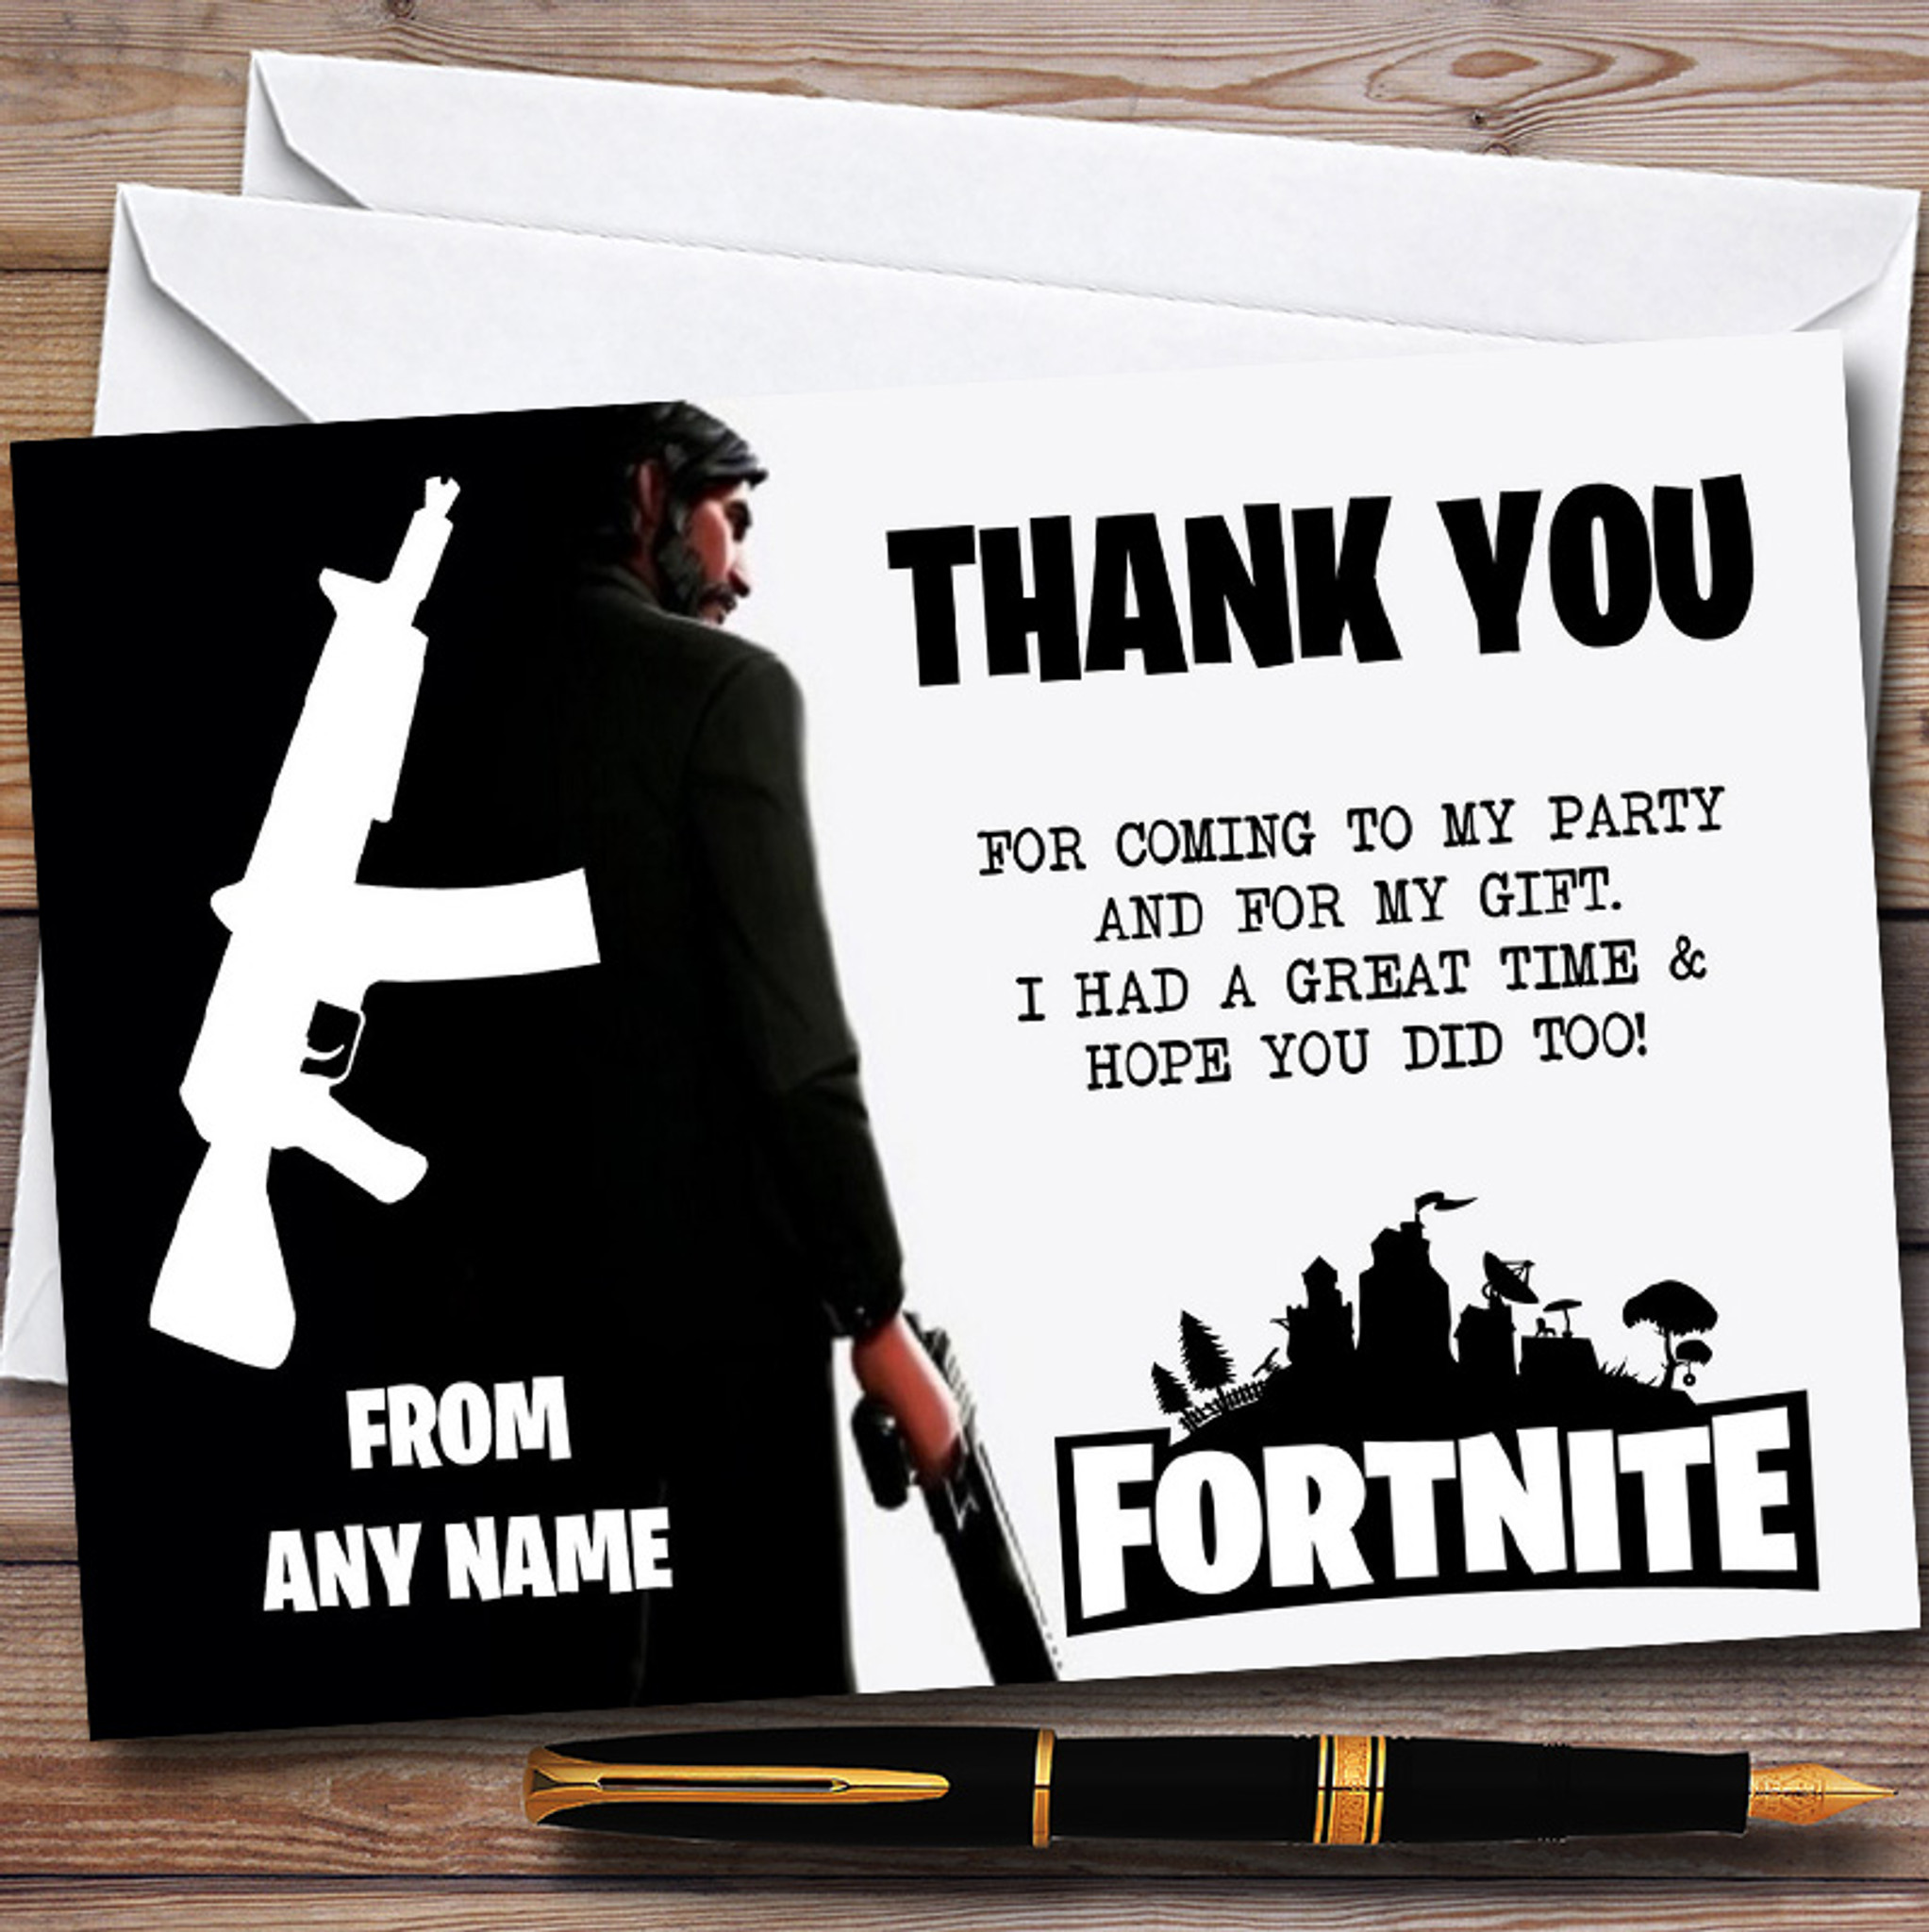 Fortnite Birthday Poster Personalised Game Fortnite Birthday Bunting Banner Black And White